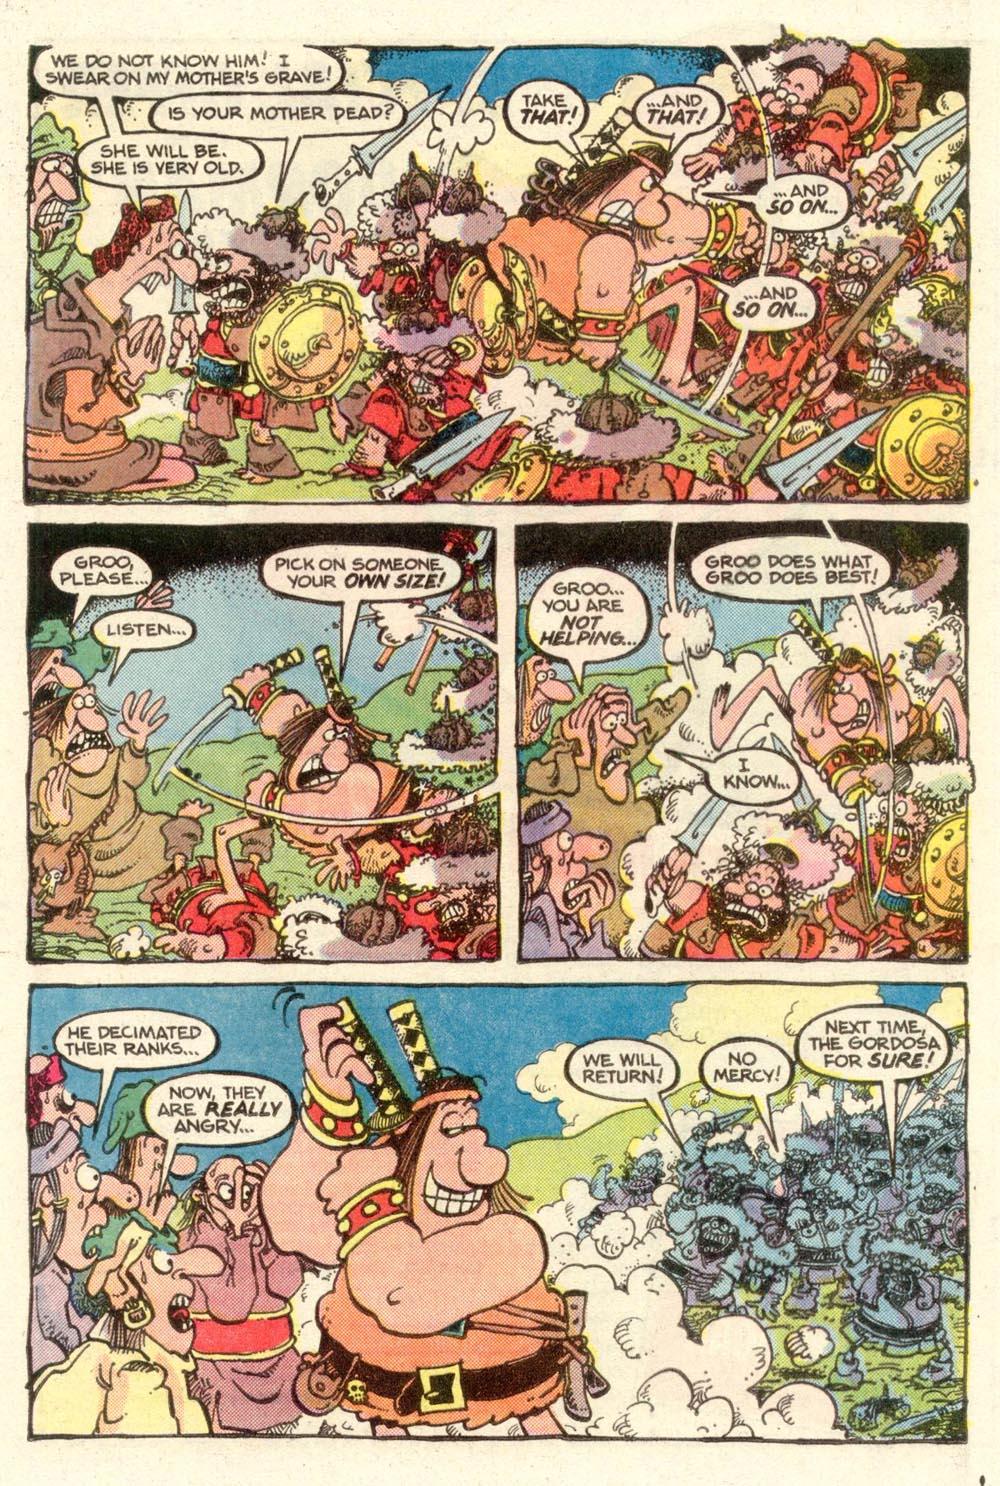 Read online Sergio Aragonés Groo the Wanderer comic -  Issue #11 - 9